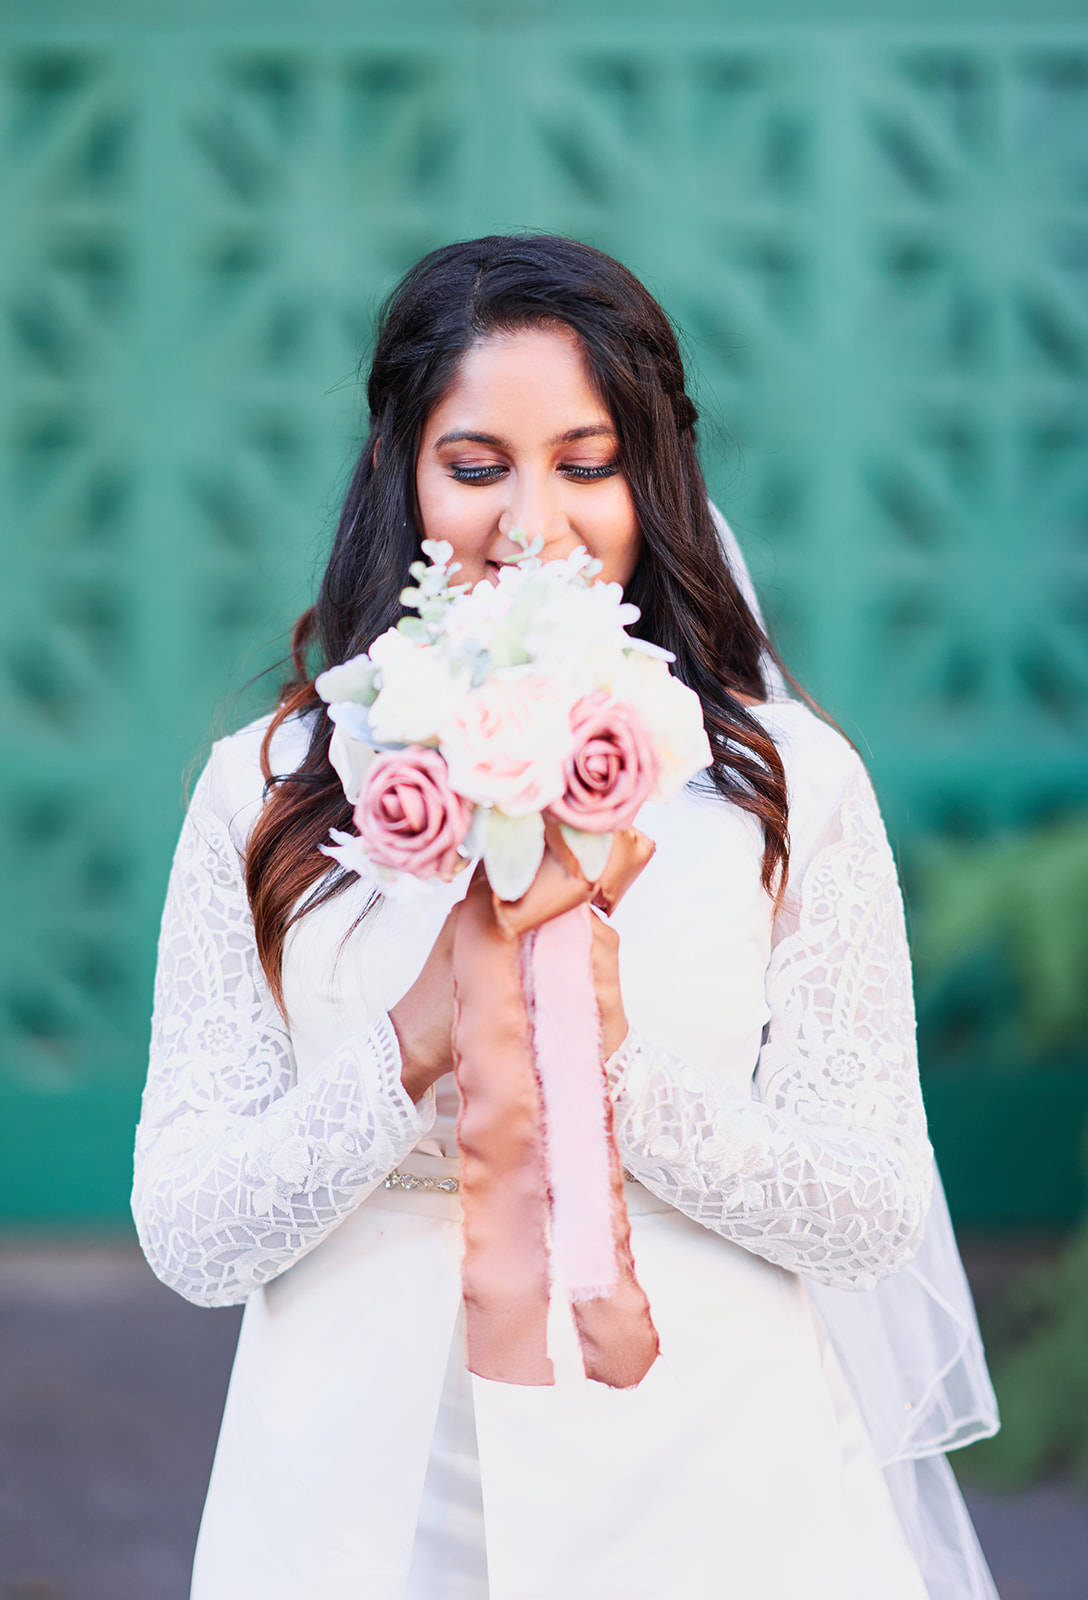 Bride Portraits Holding Flowers Poses Ideas Afewgoodclicks